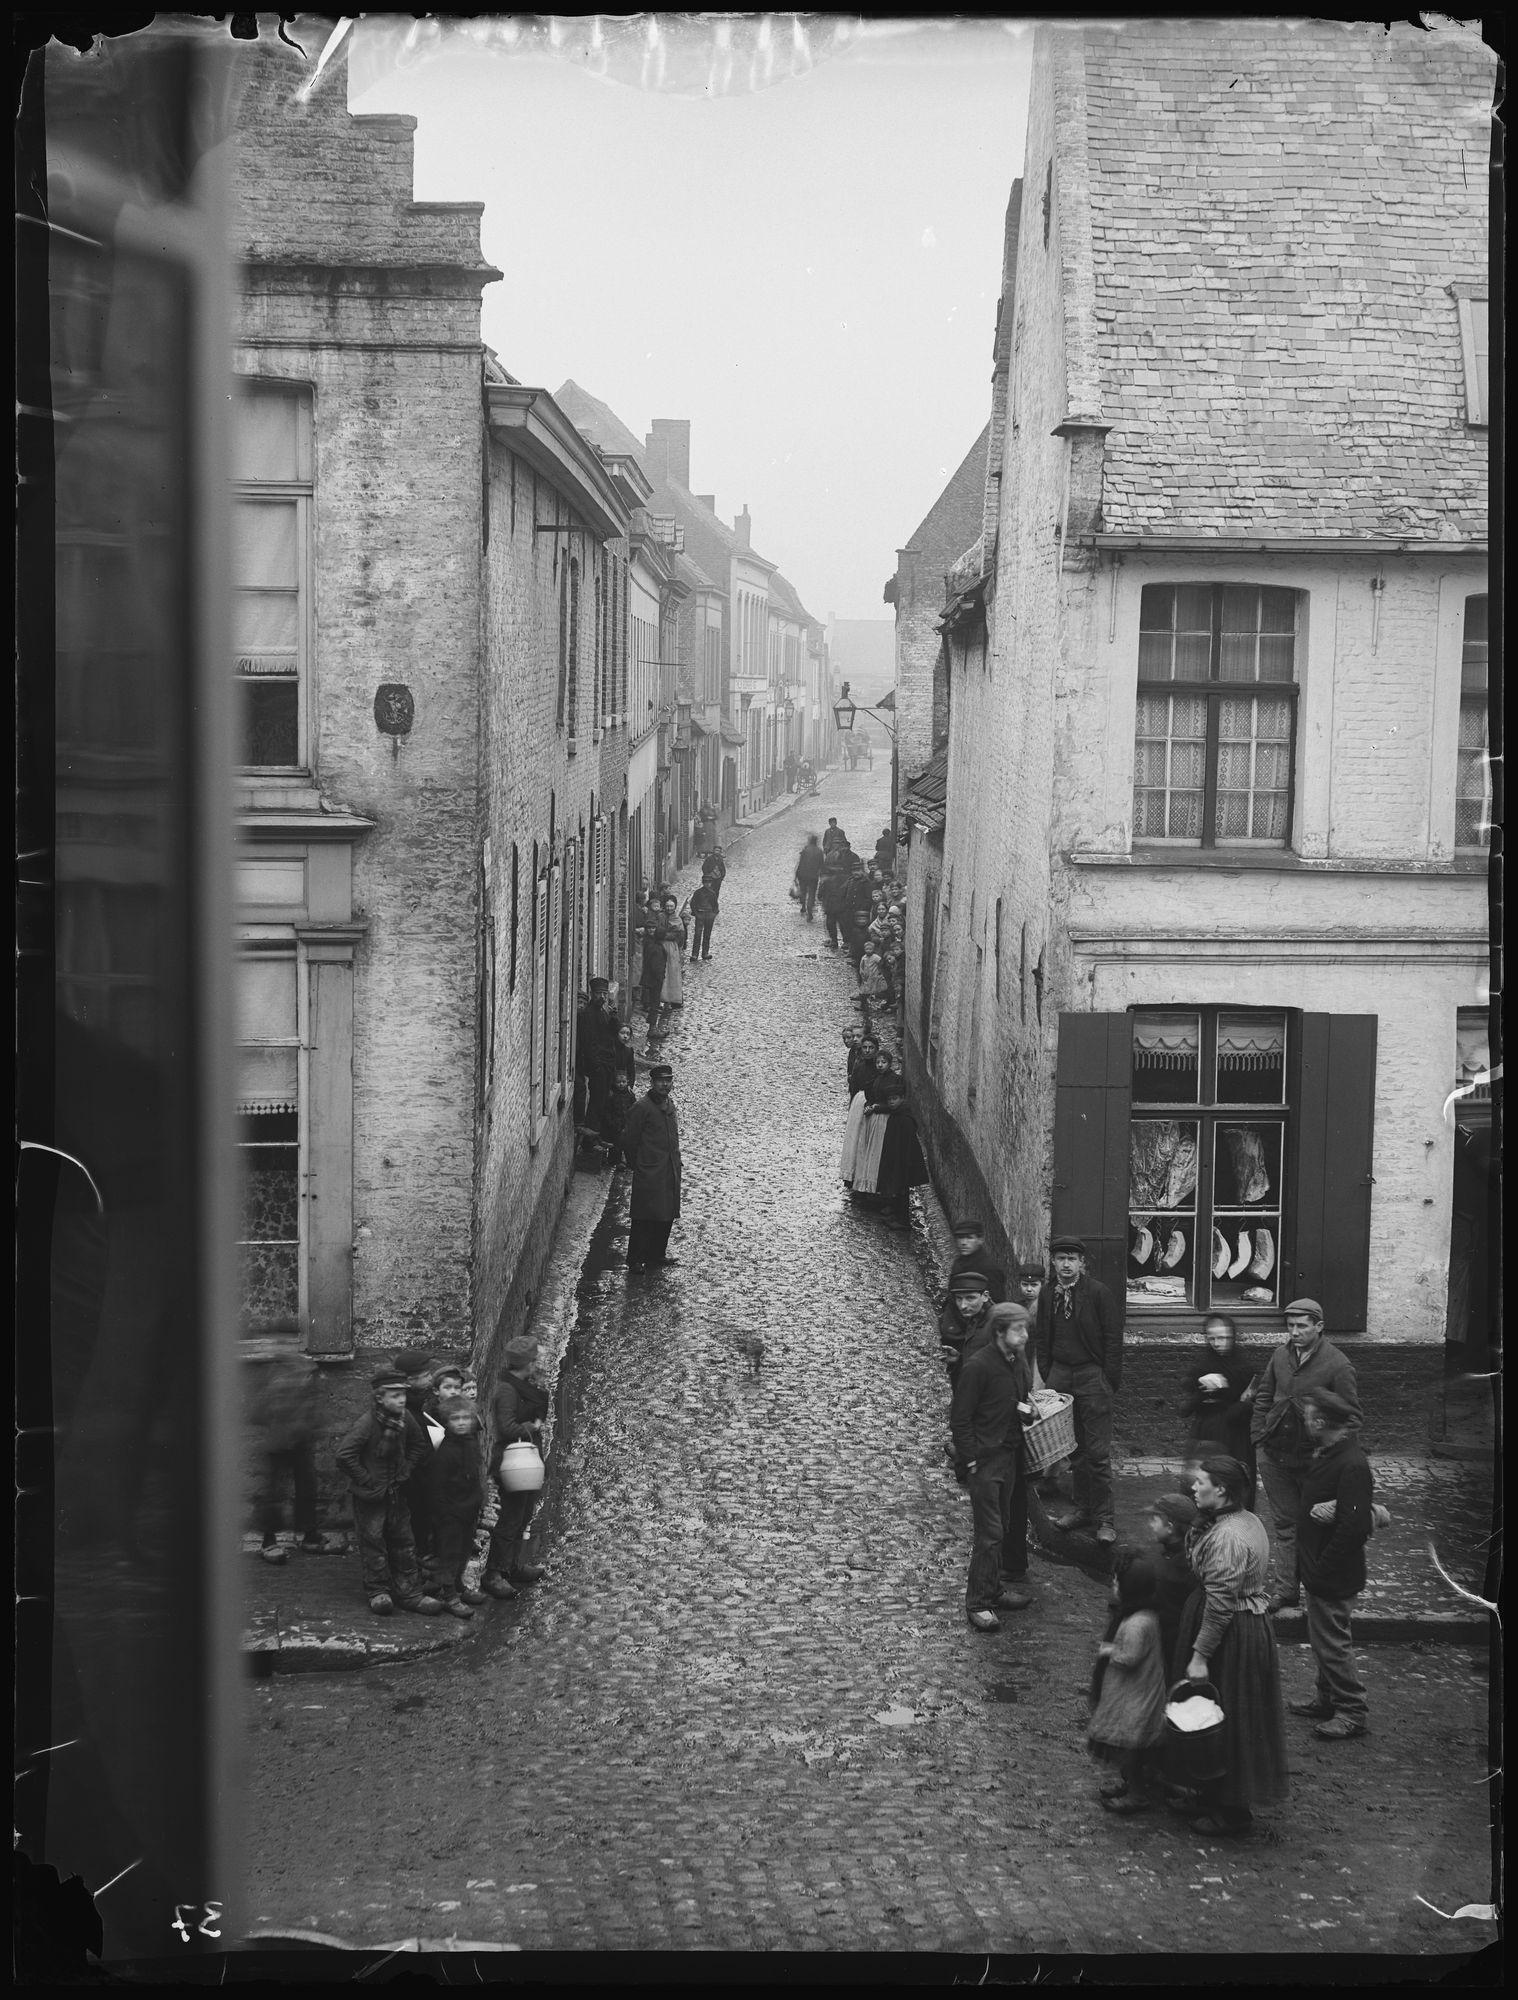 Kapelstraat in 1897